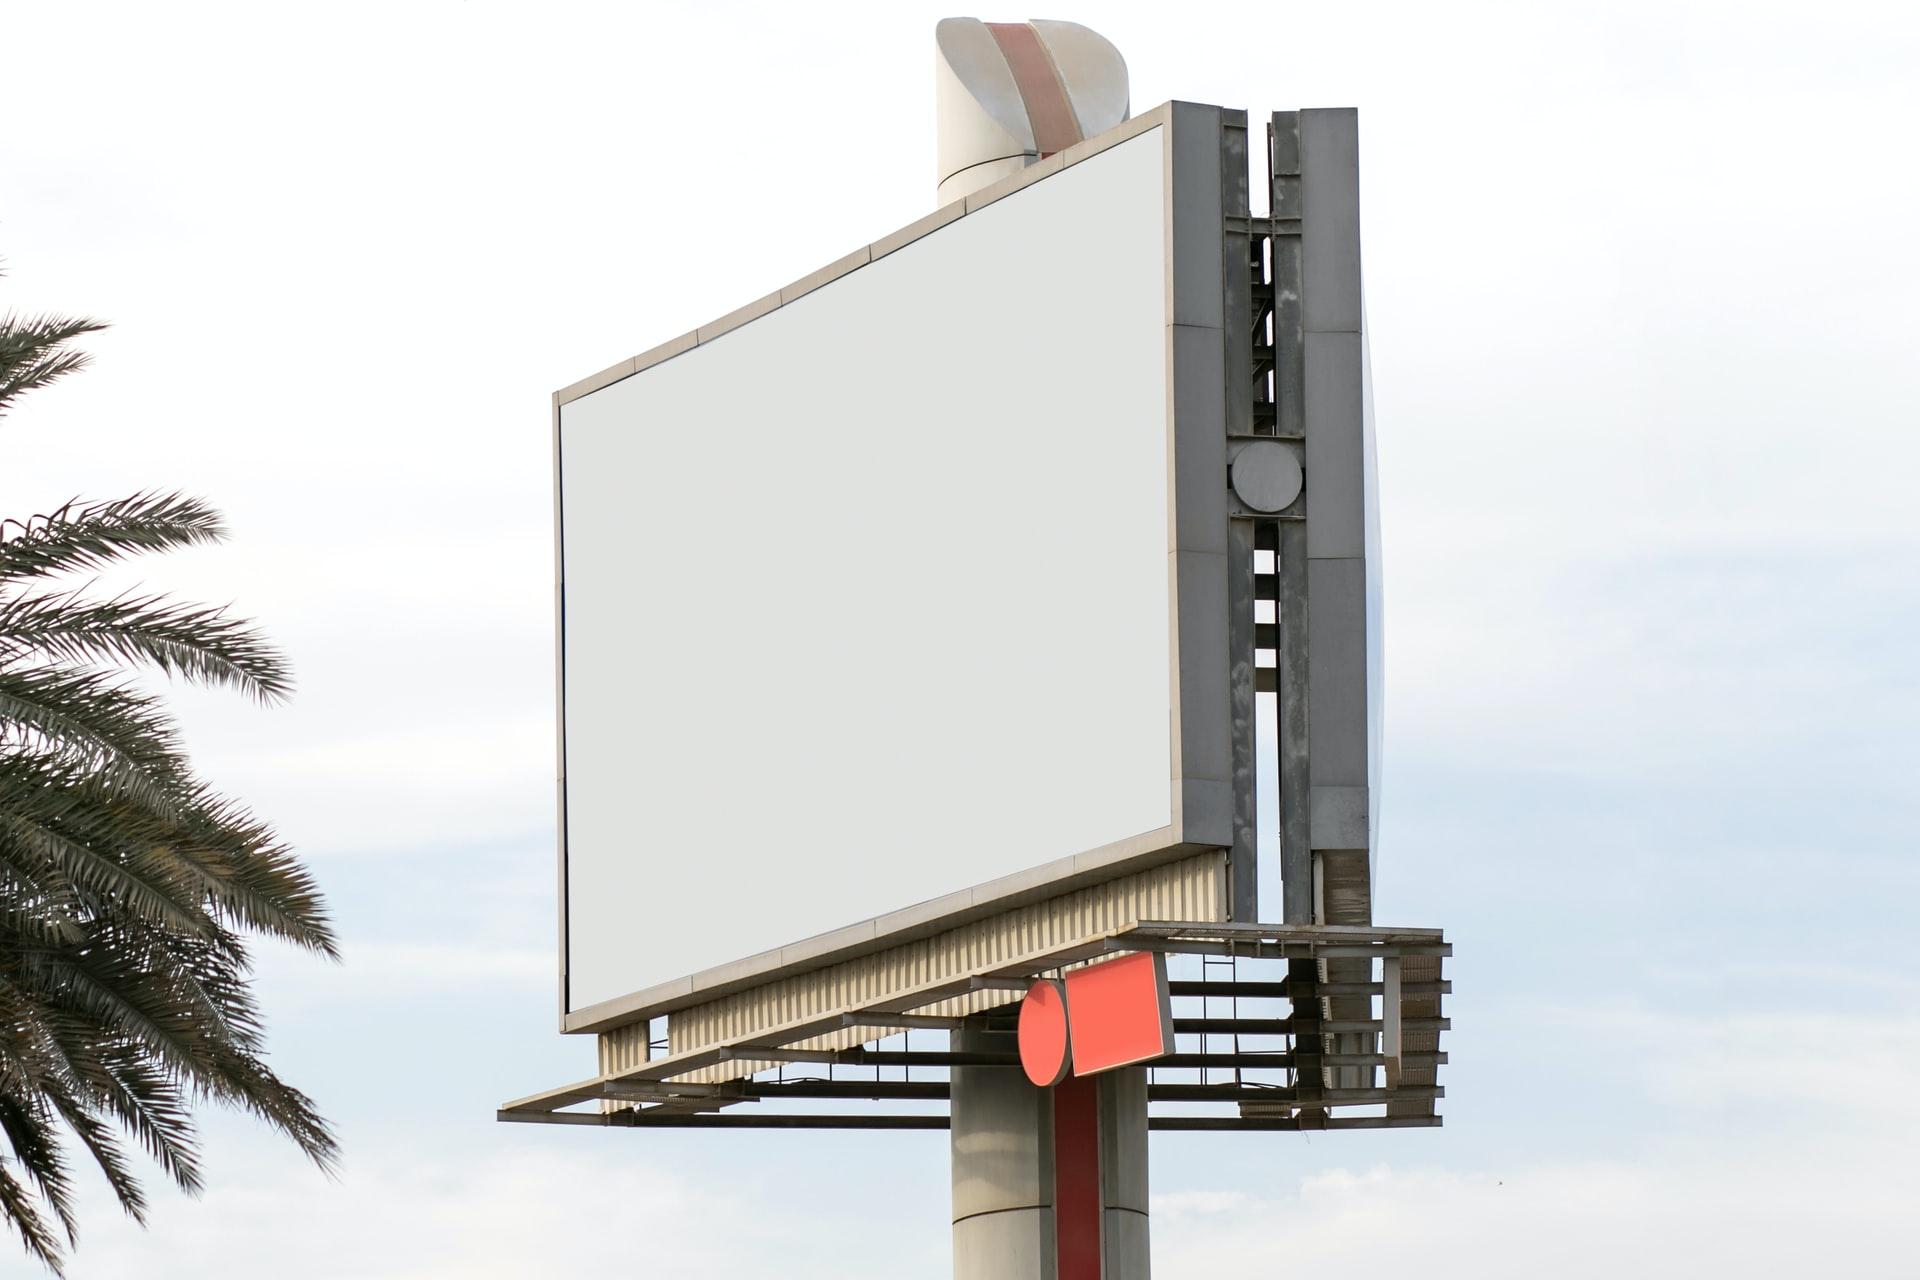 advertisement to teach